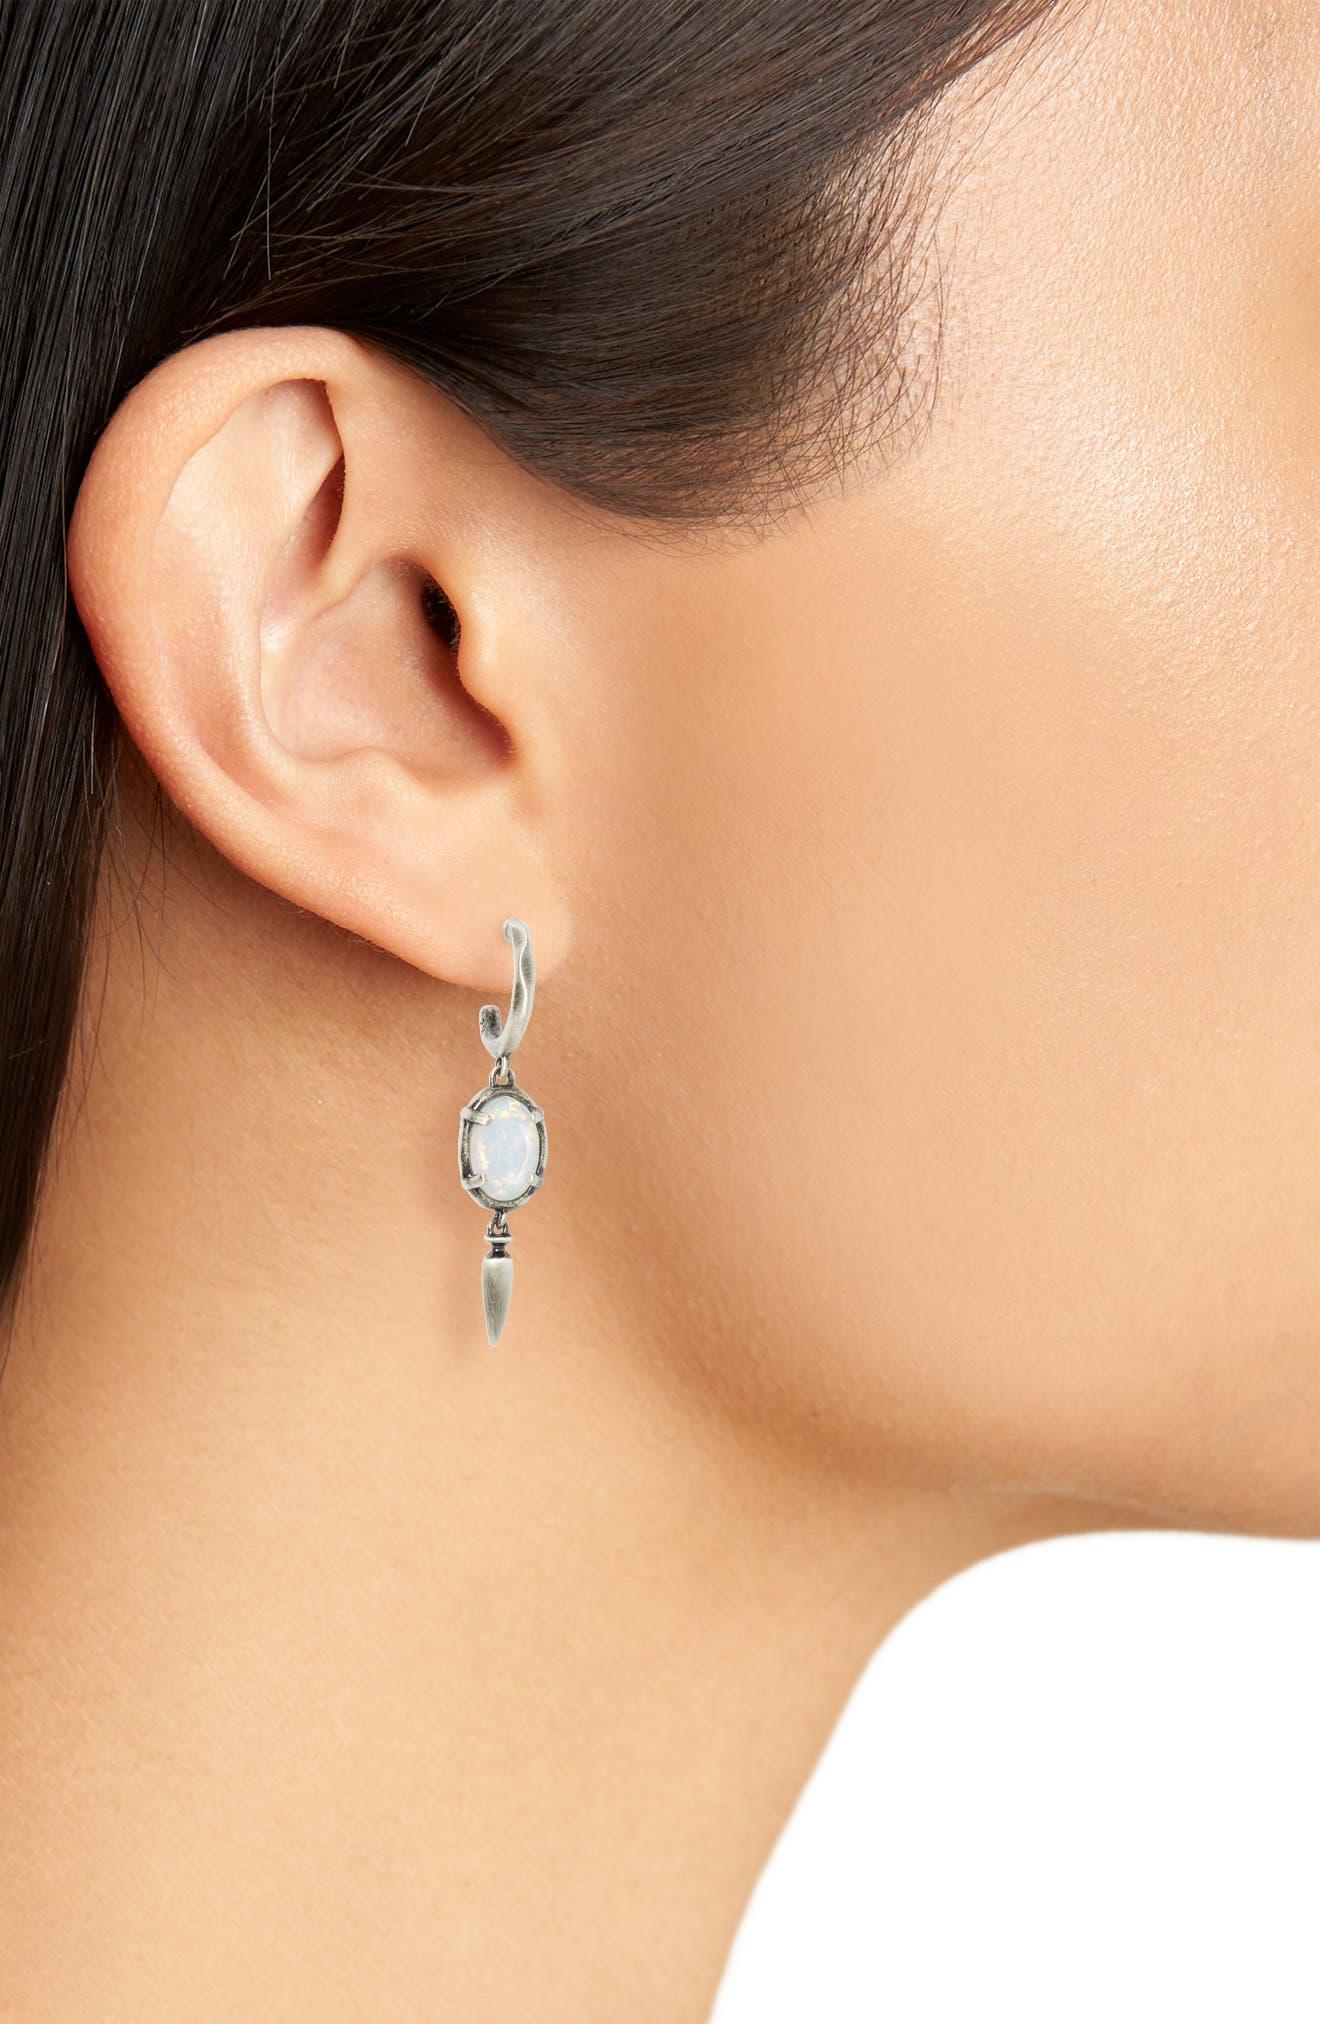 Trixie Drop Earrings,                             Alternate thumbnail 2, color,                             040